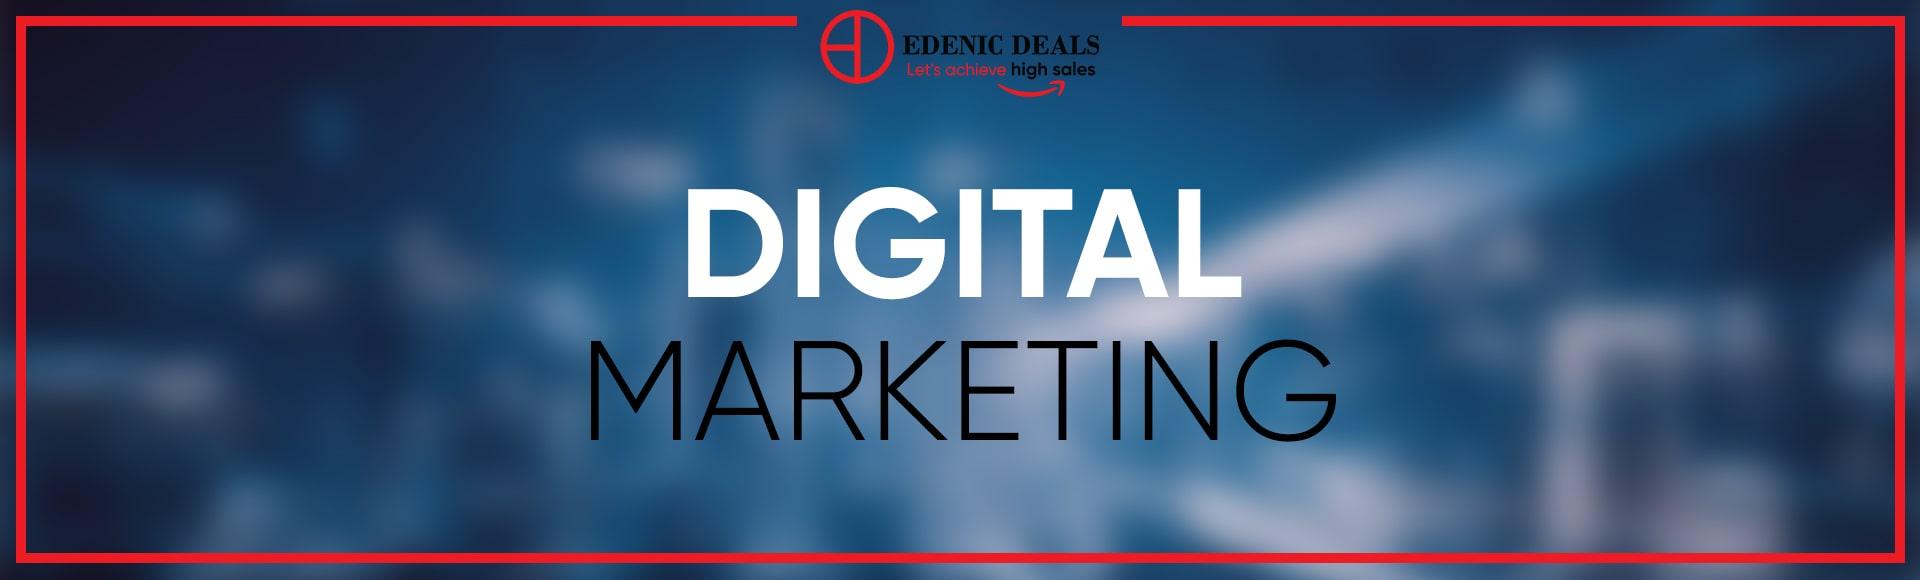 Digital Marketing Edenic Deals